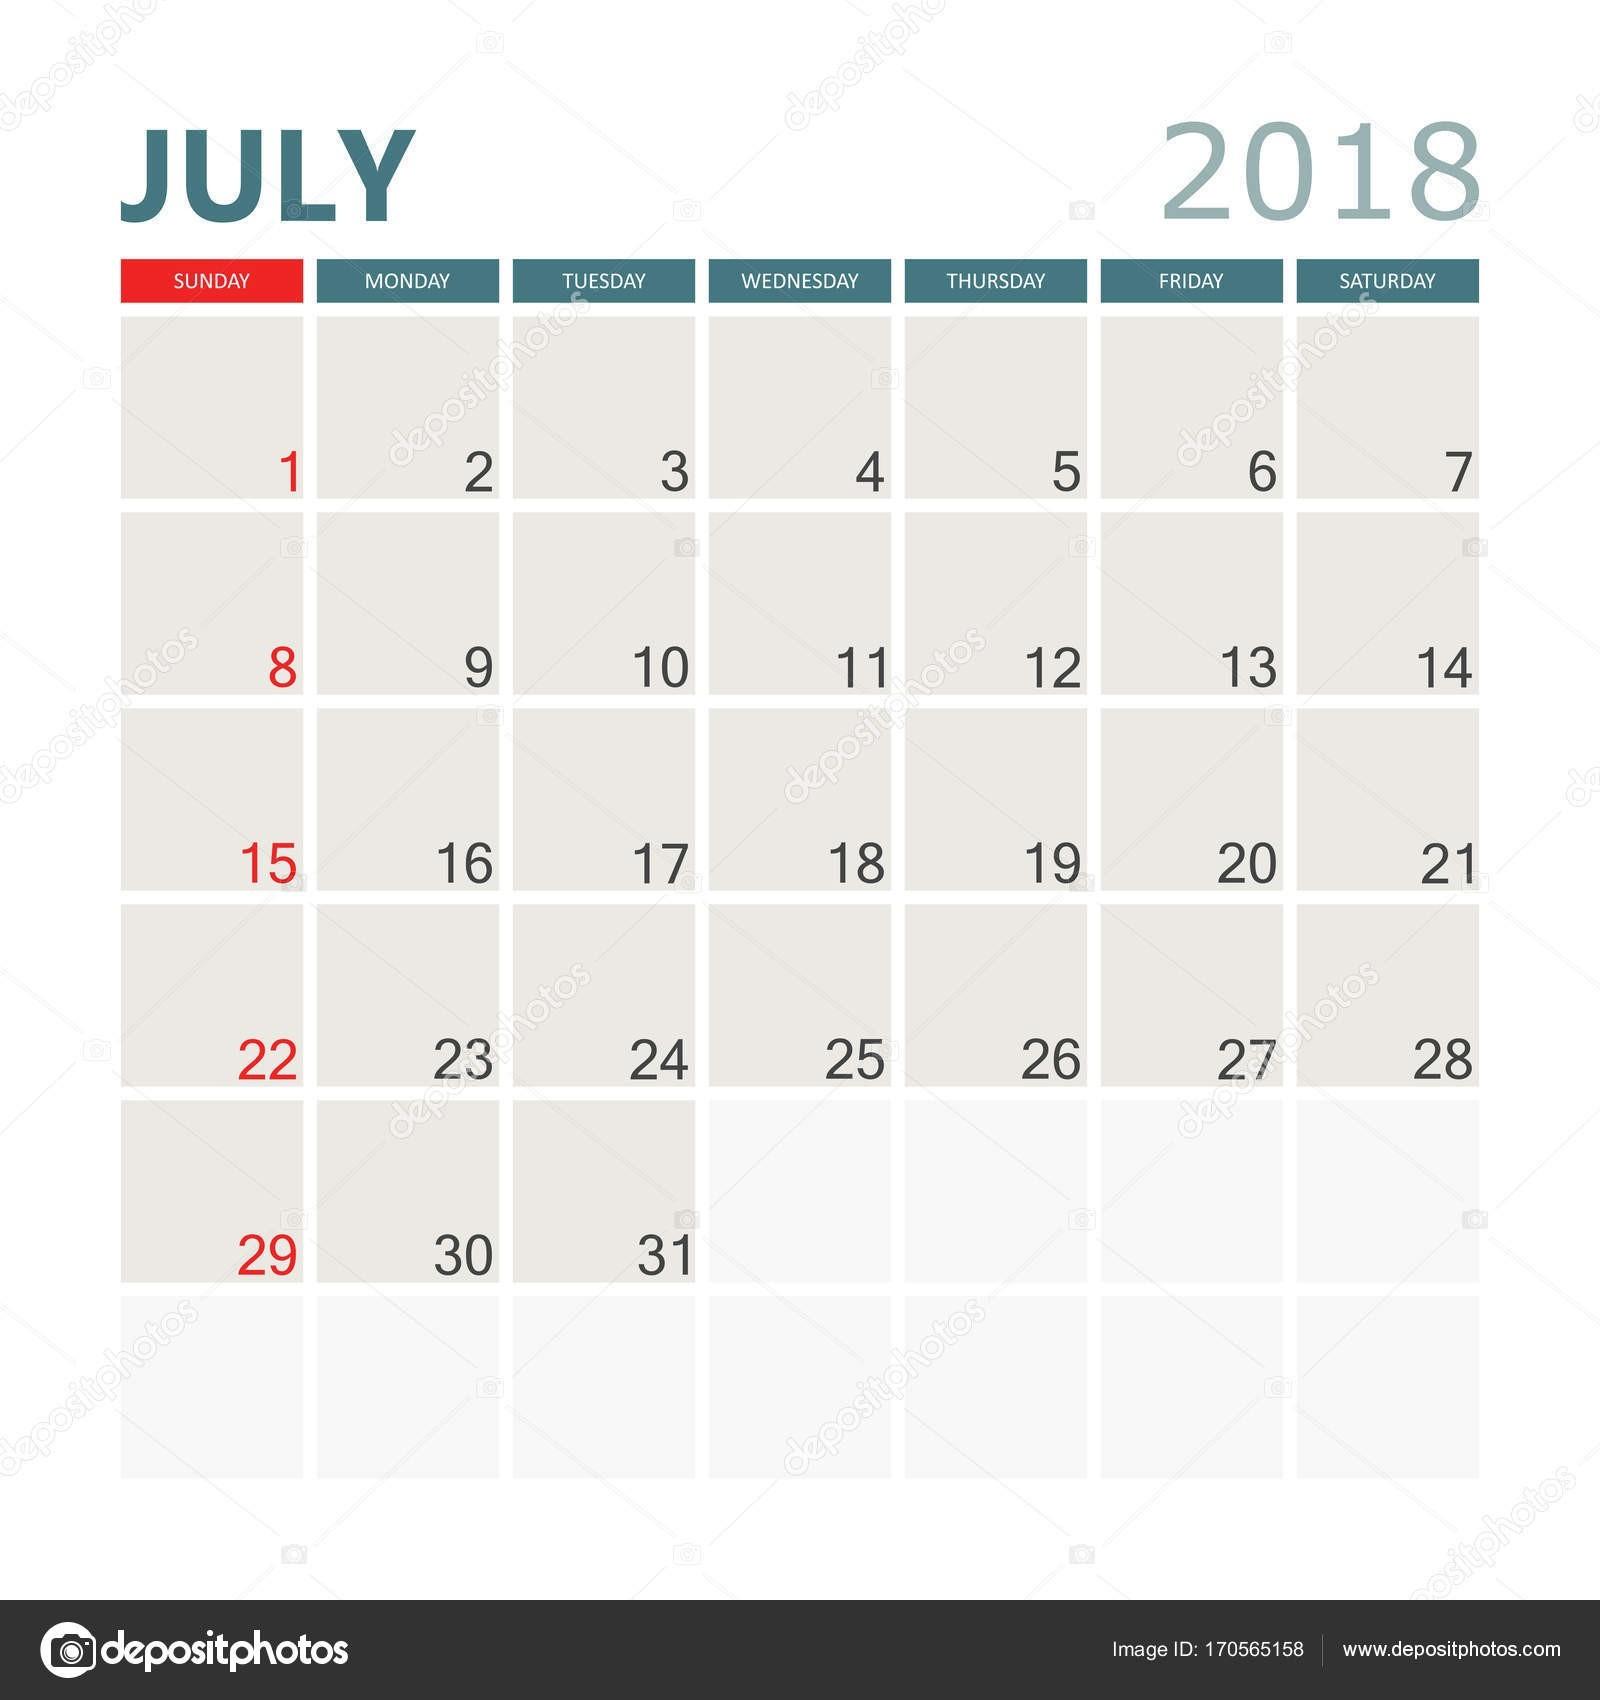 Depo Provera Calendar Printable Pdf | Calendar Template